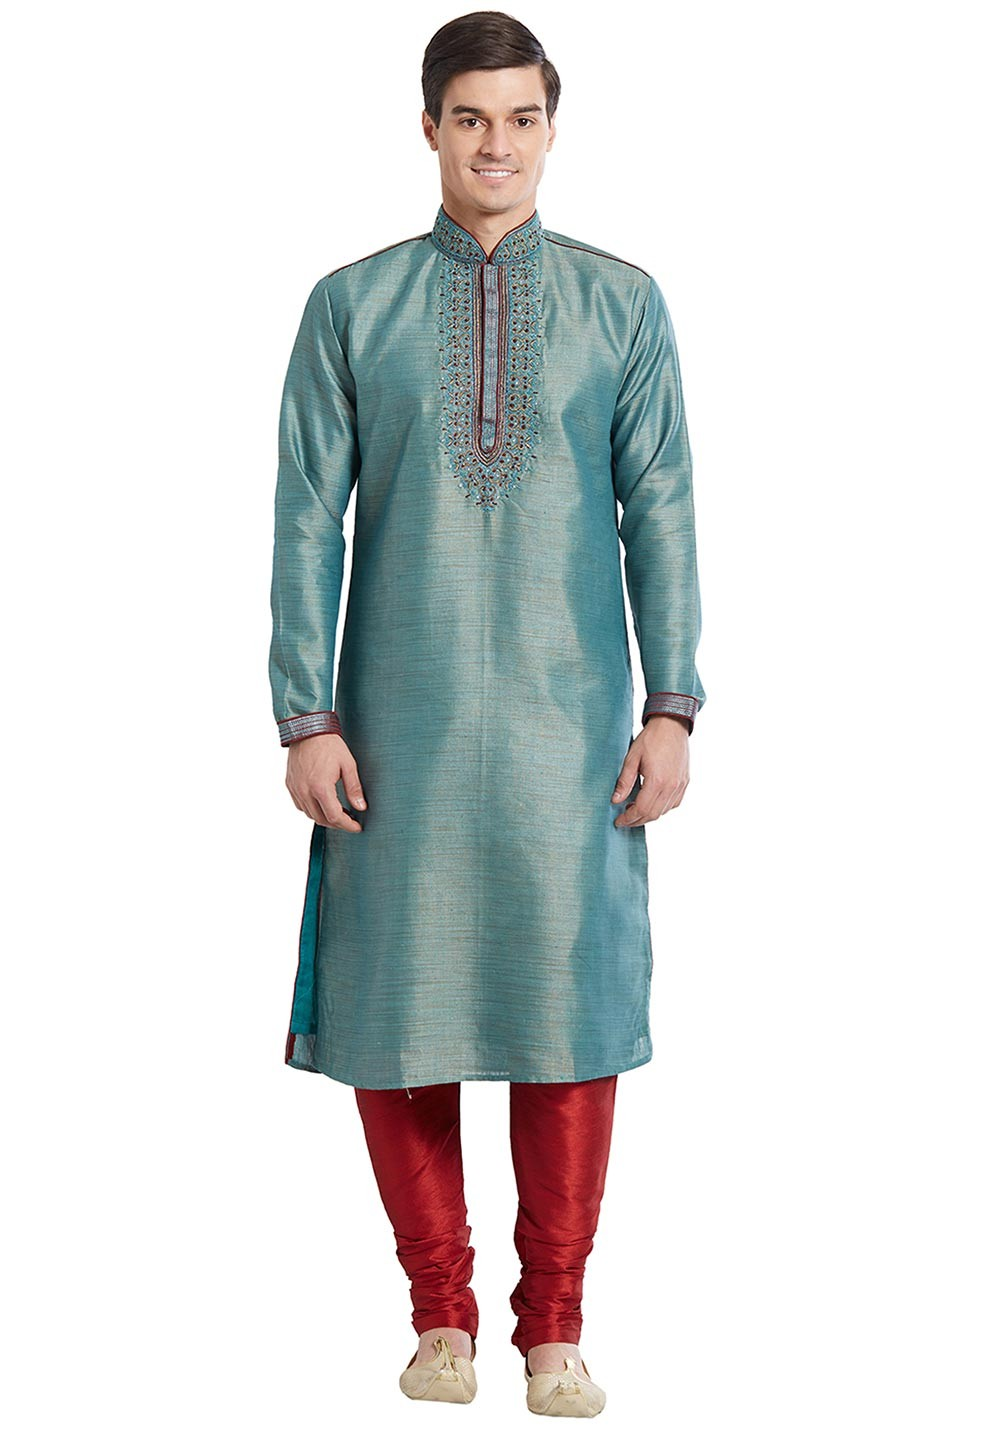 Green Color Bhagalpuri Silk Readymade Kurta Pajama With Embroidery Work.